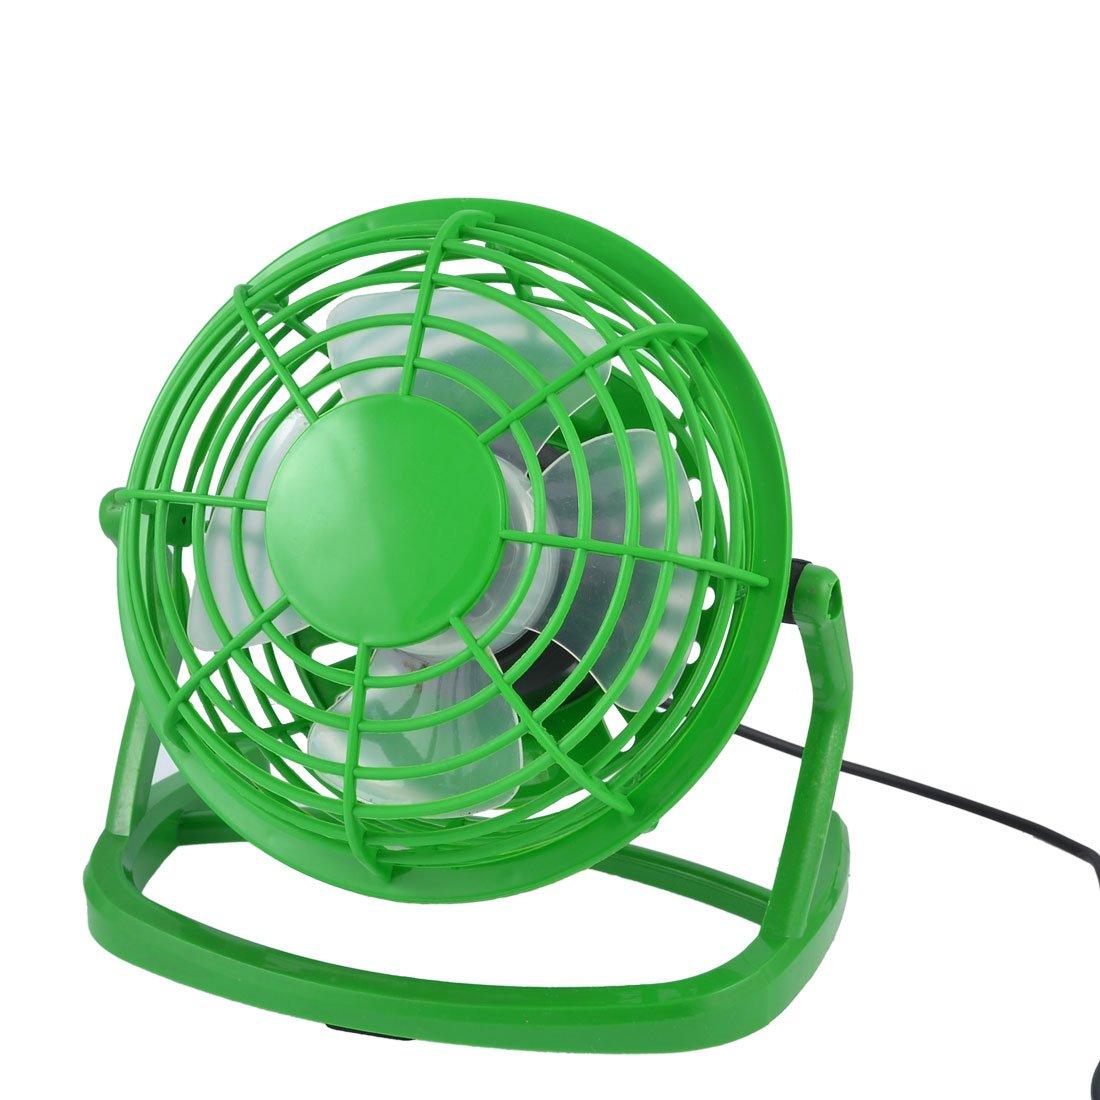 GTFS Hot 360 Degree Rotation LapTop font b PC b font Cool Cooler Green Plastic Desk